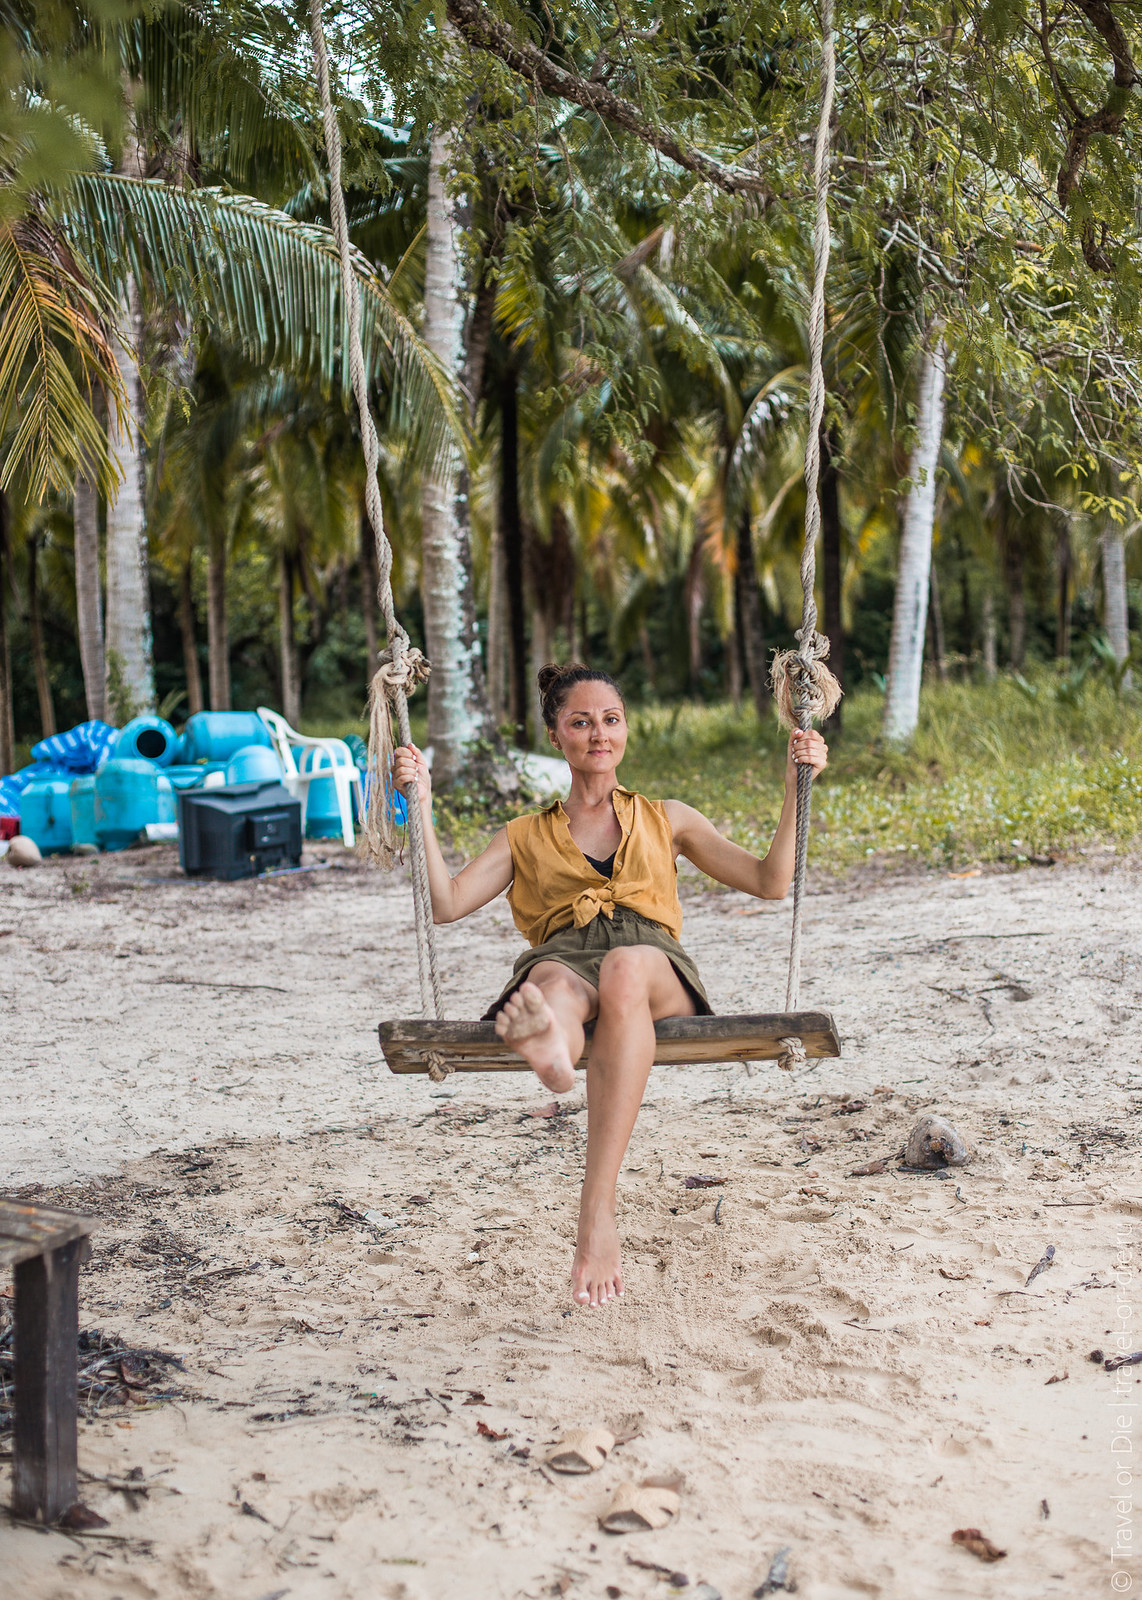 Rang-Yai-Island-Phuket-7232